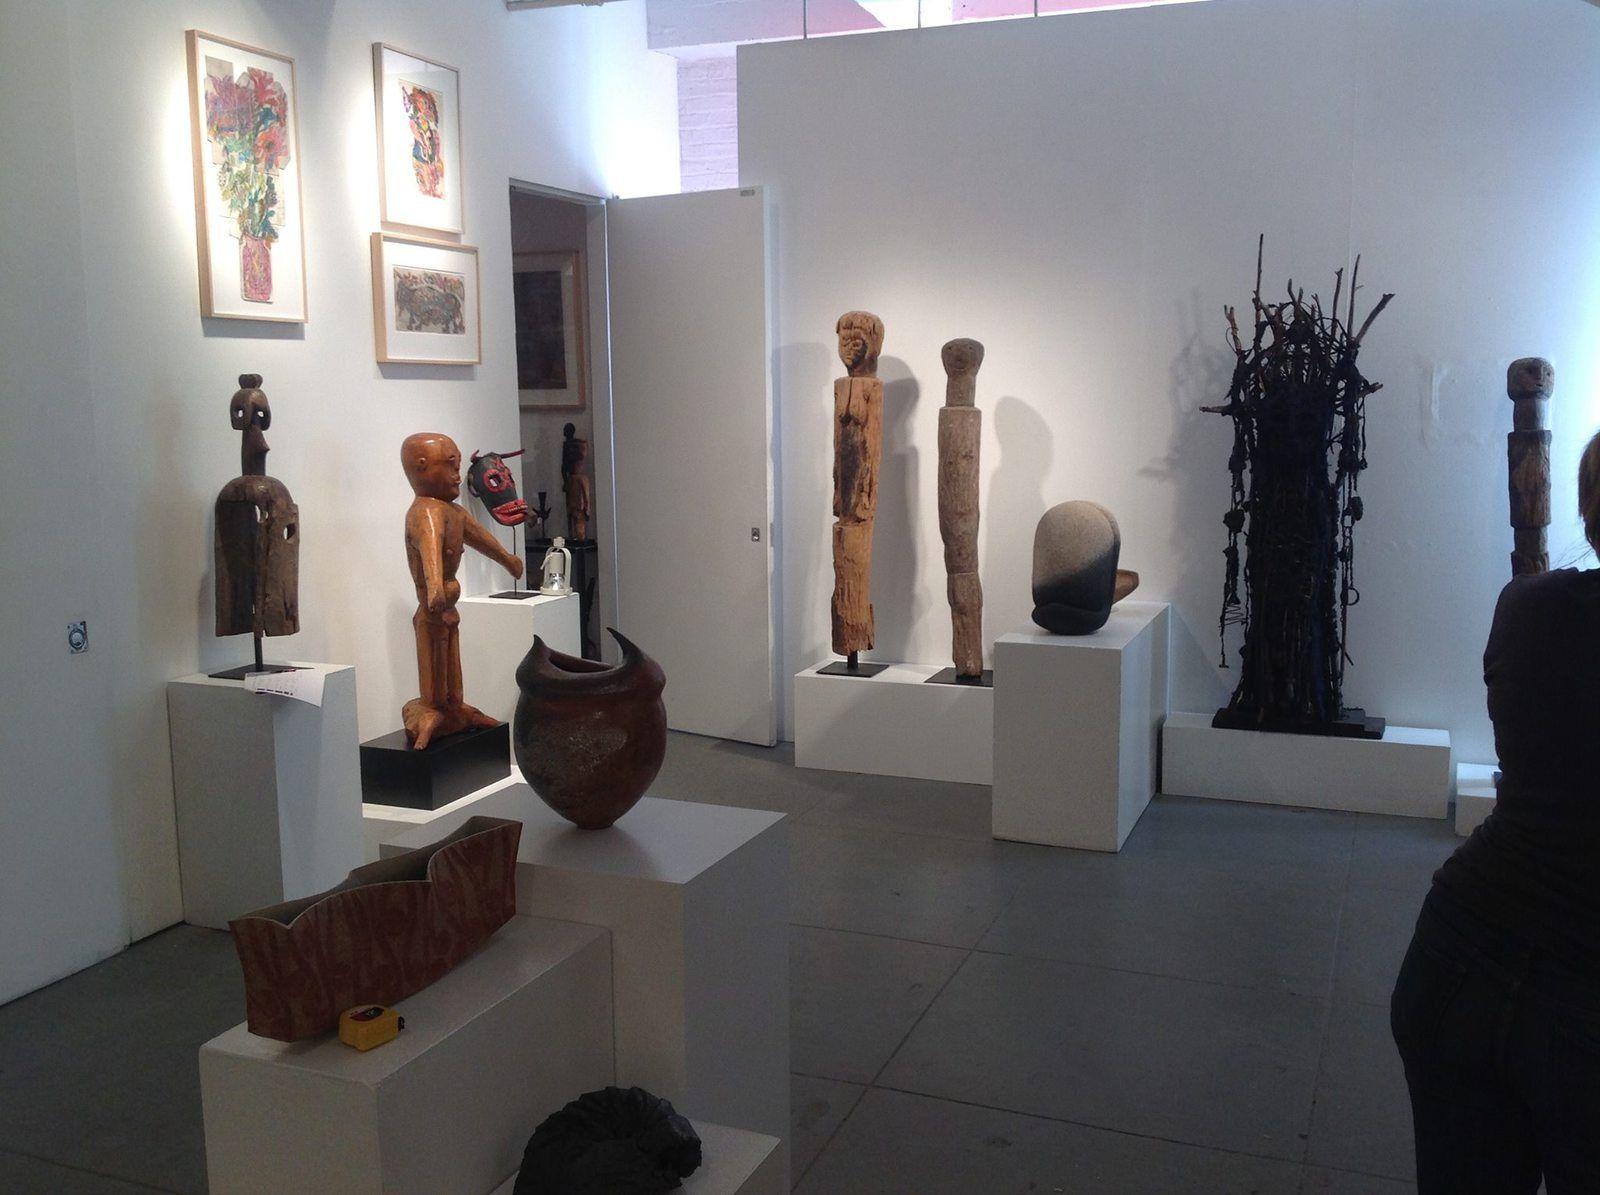 Installation de l'exposition Rhizome 2015 - Photos Cavin-Morris Gallery